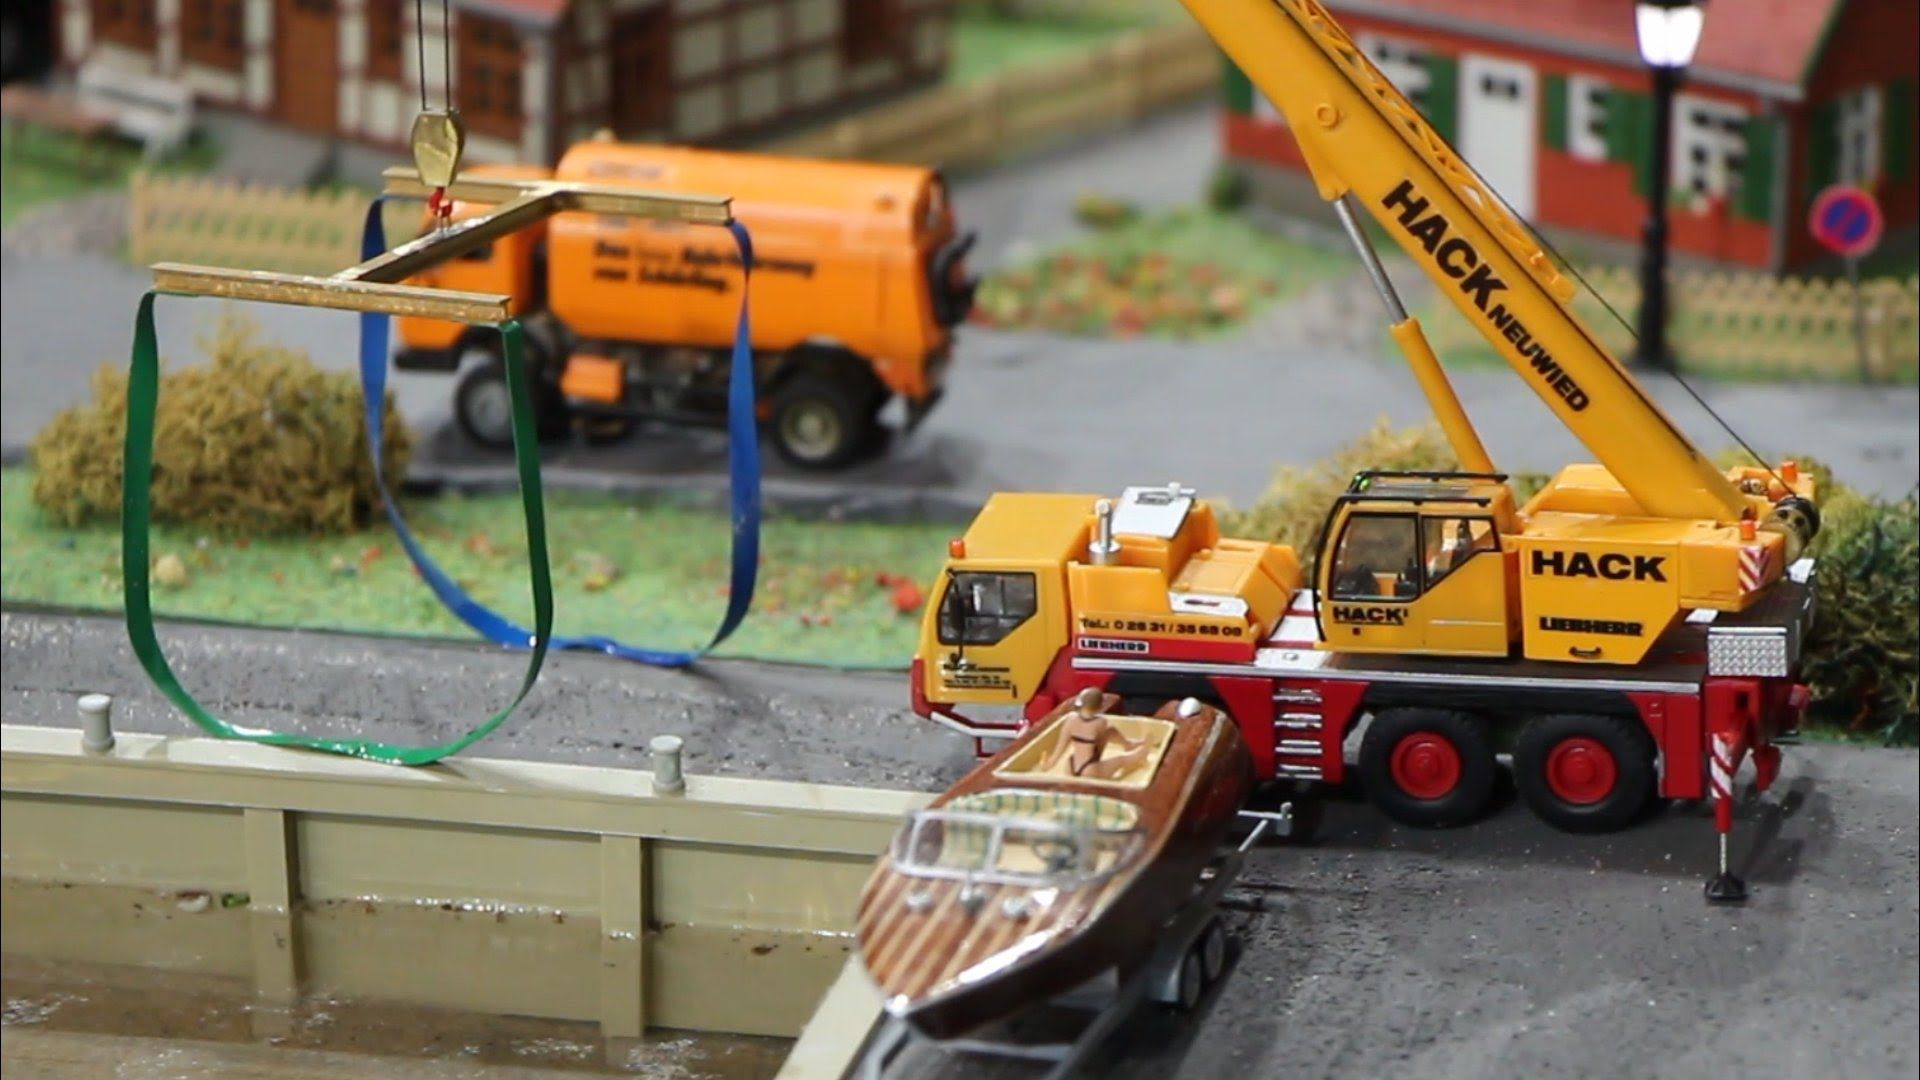 mikromodellbau 1 87 rc truck crane lifting boat rc. Black Bedroom Furniture Sets. Home Design Ideas